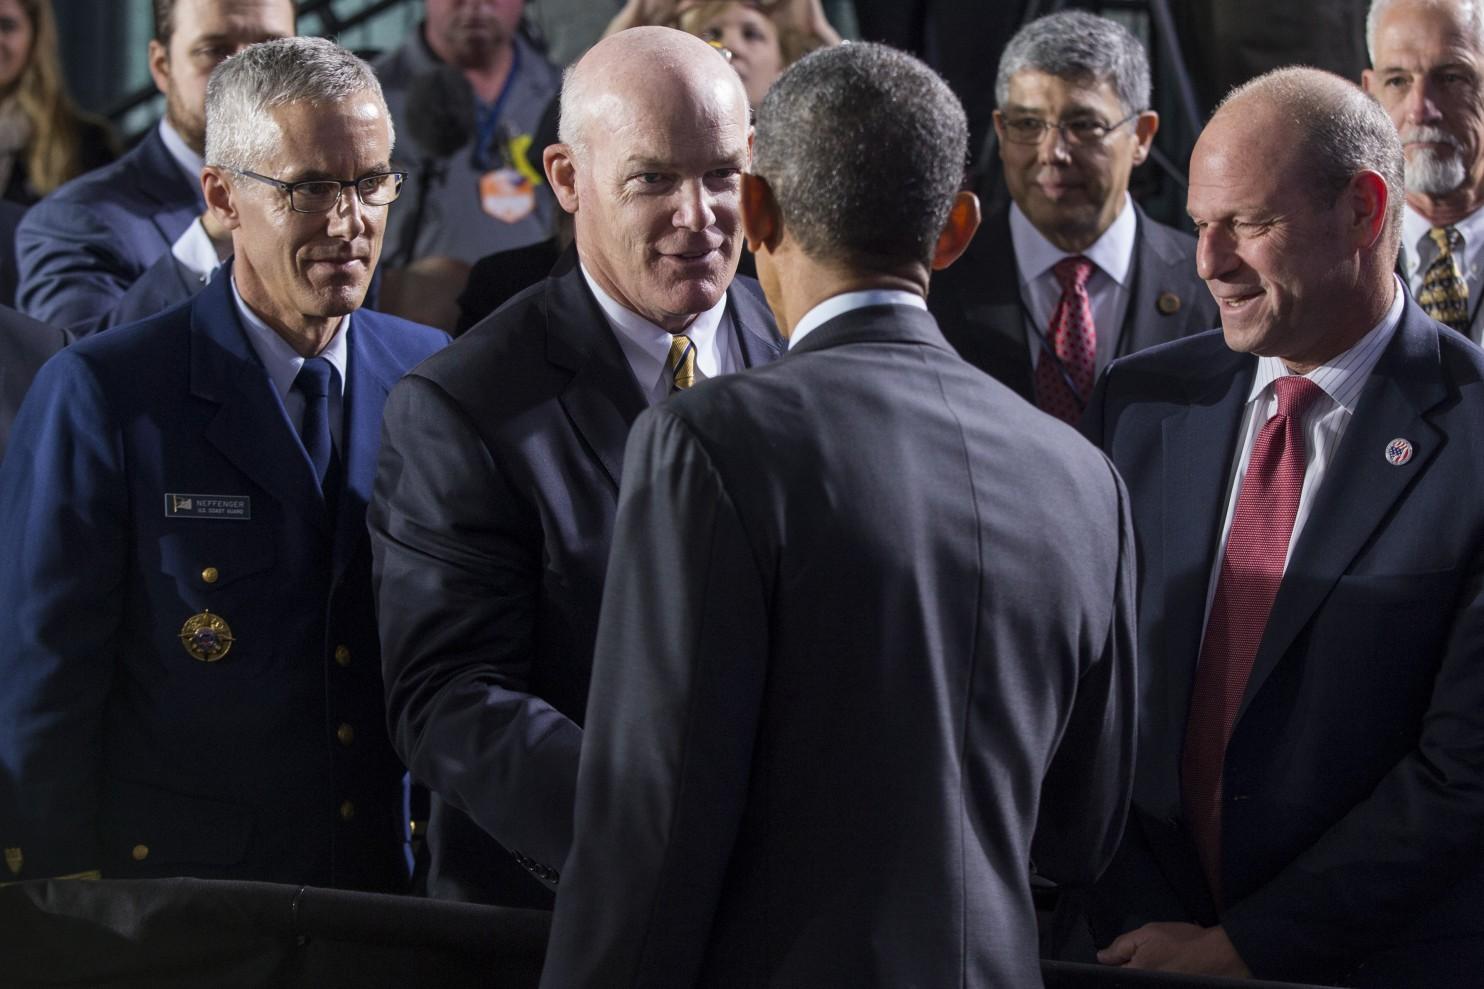 Obama, Secret Service director Joseph P. Clancy